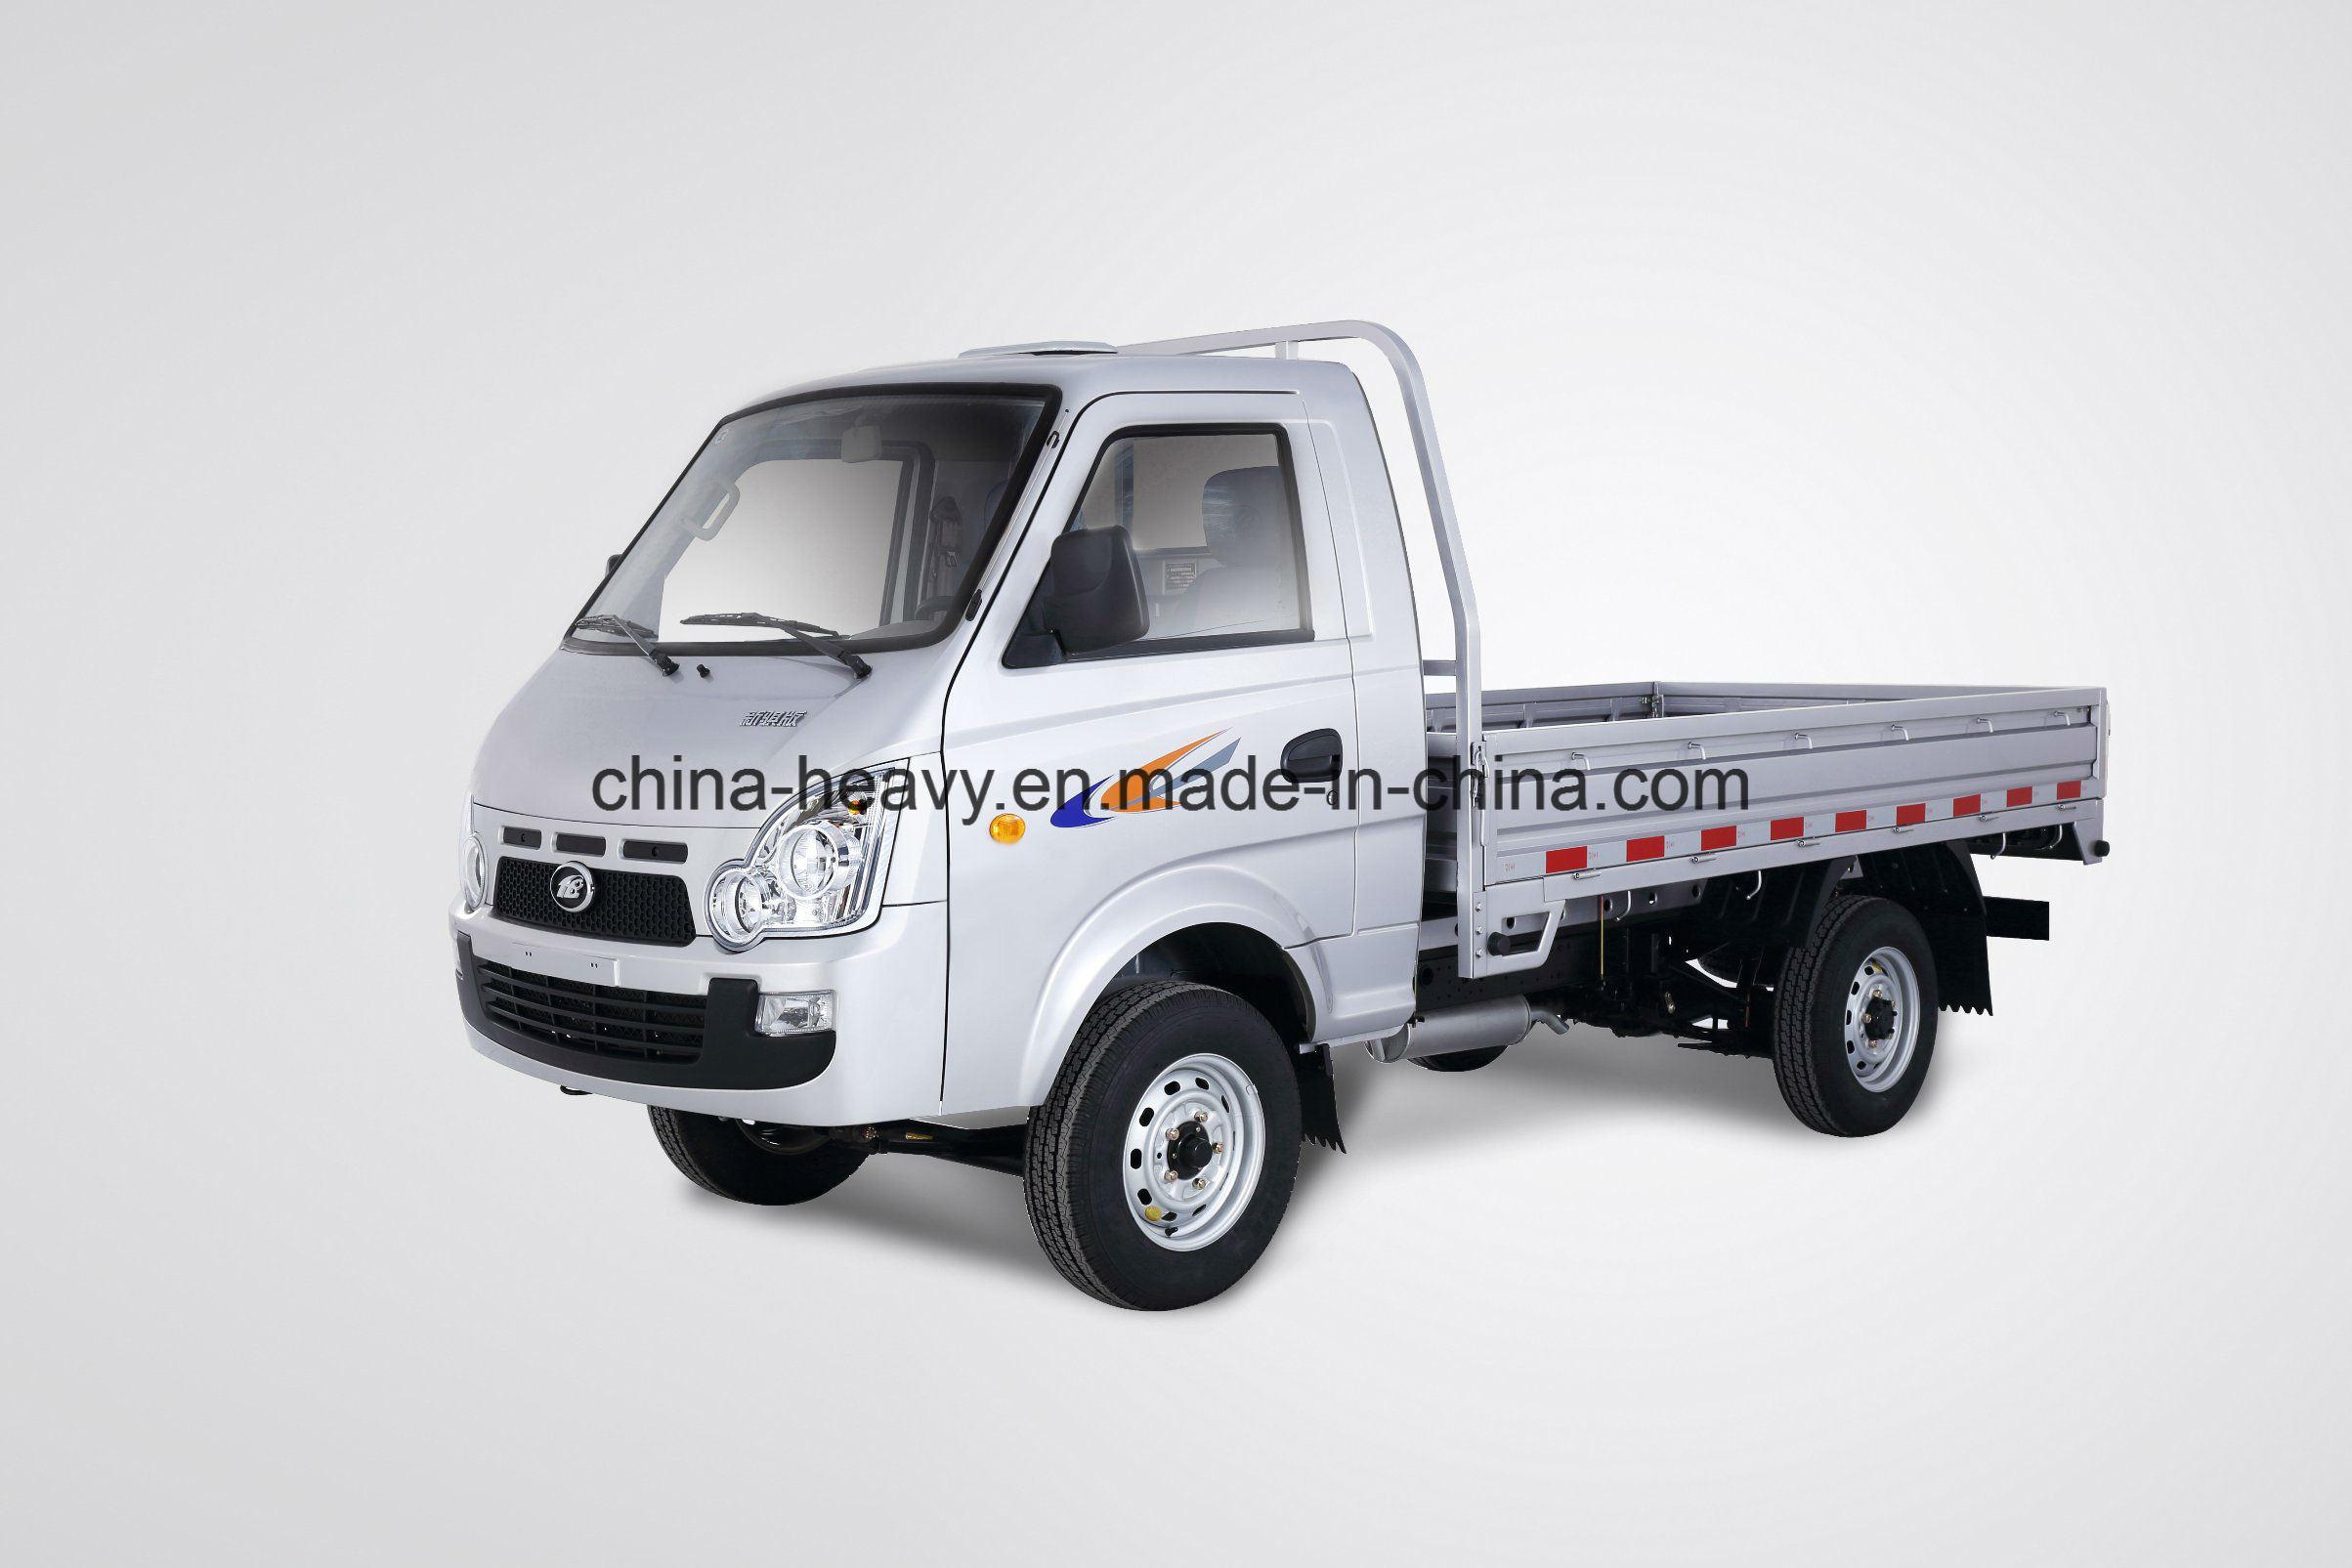 Hot Sale Rhd/LHD 1.2L Gasoline 62.5 HP Single Row Mini/Small Cargo Lorry Truck